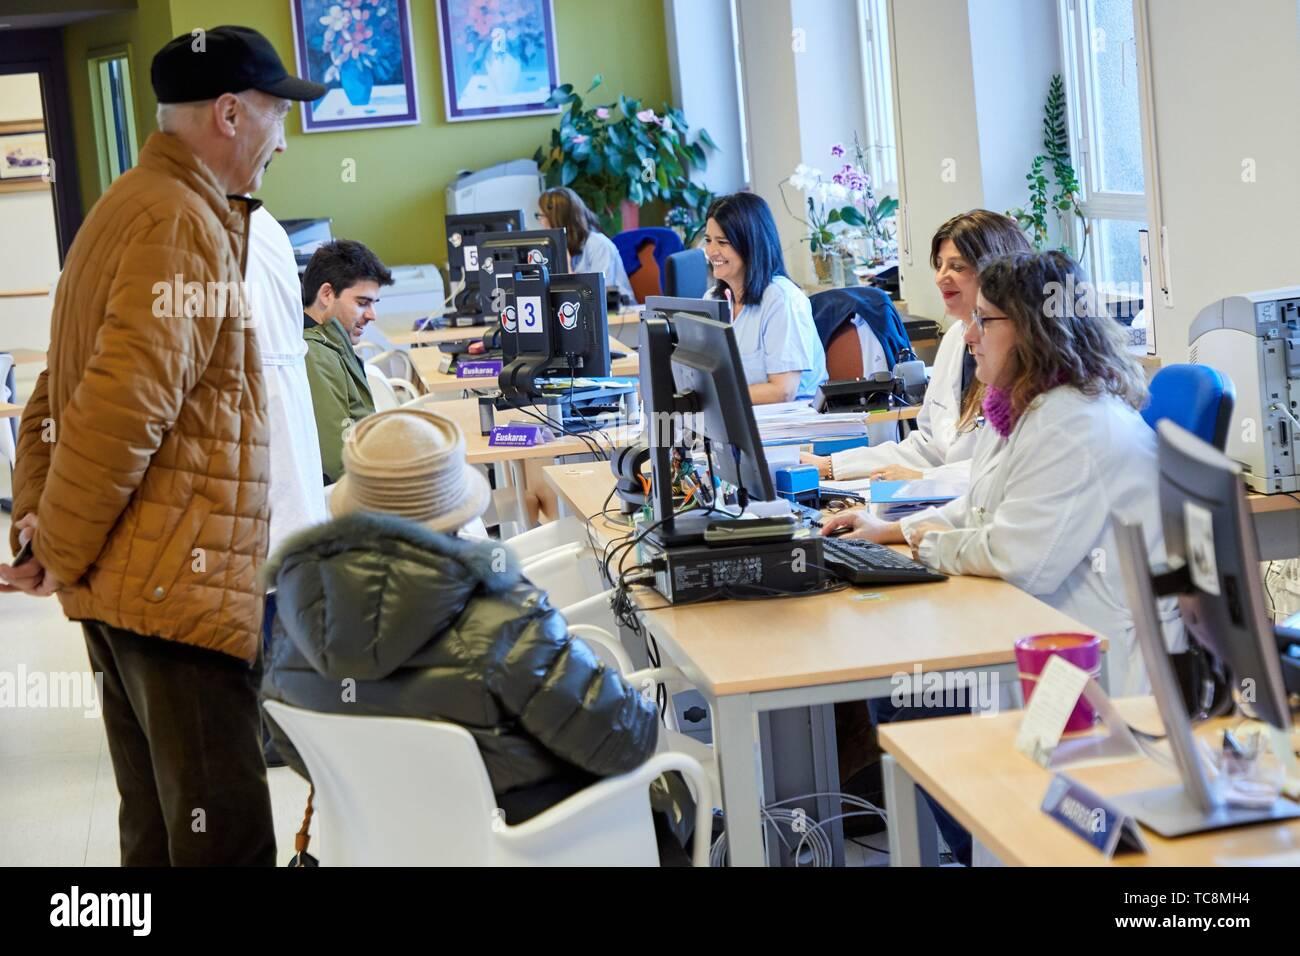 SAPU, Servicio de Atención al Paciente y Usuario, paciente y servicio de usuario, Hospital Donostia, San Sebastián, Gipuzkoa, País Vasco, España Foto de stock